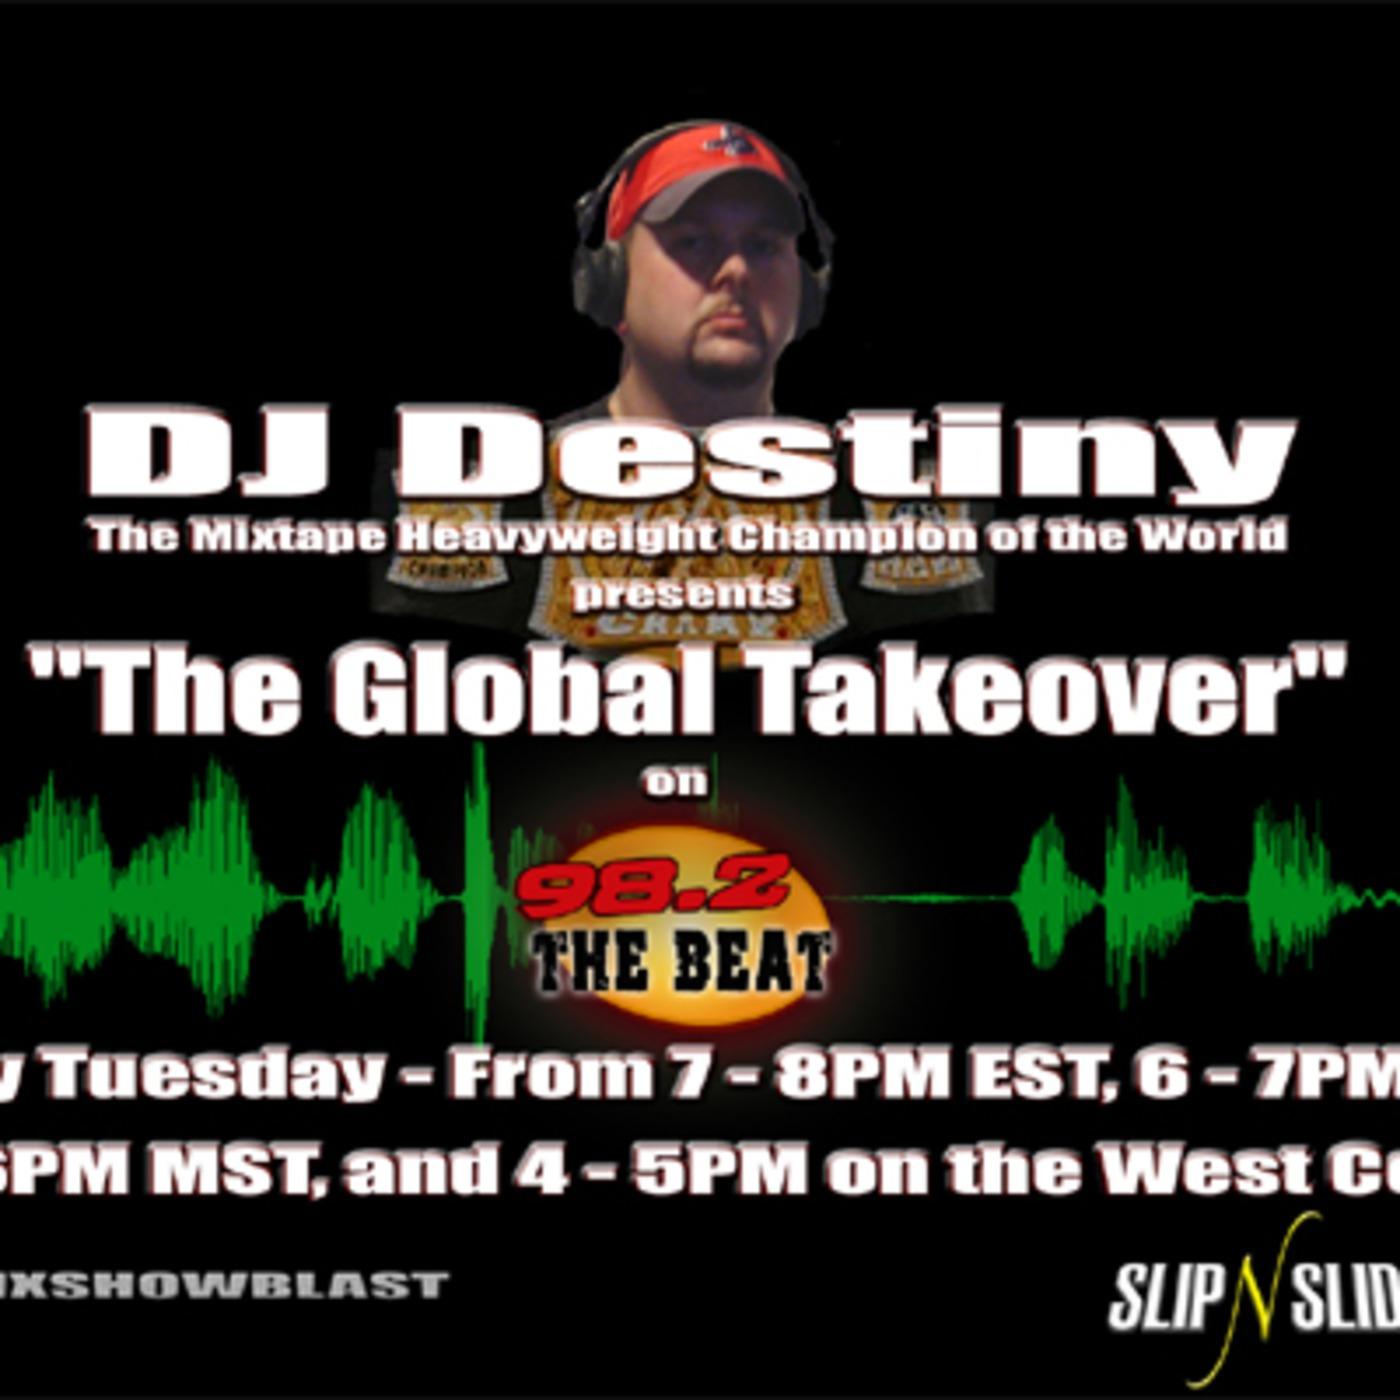 DJ Destiny